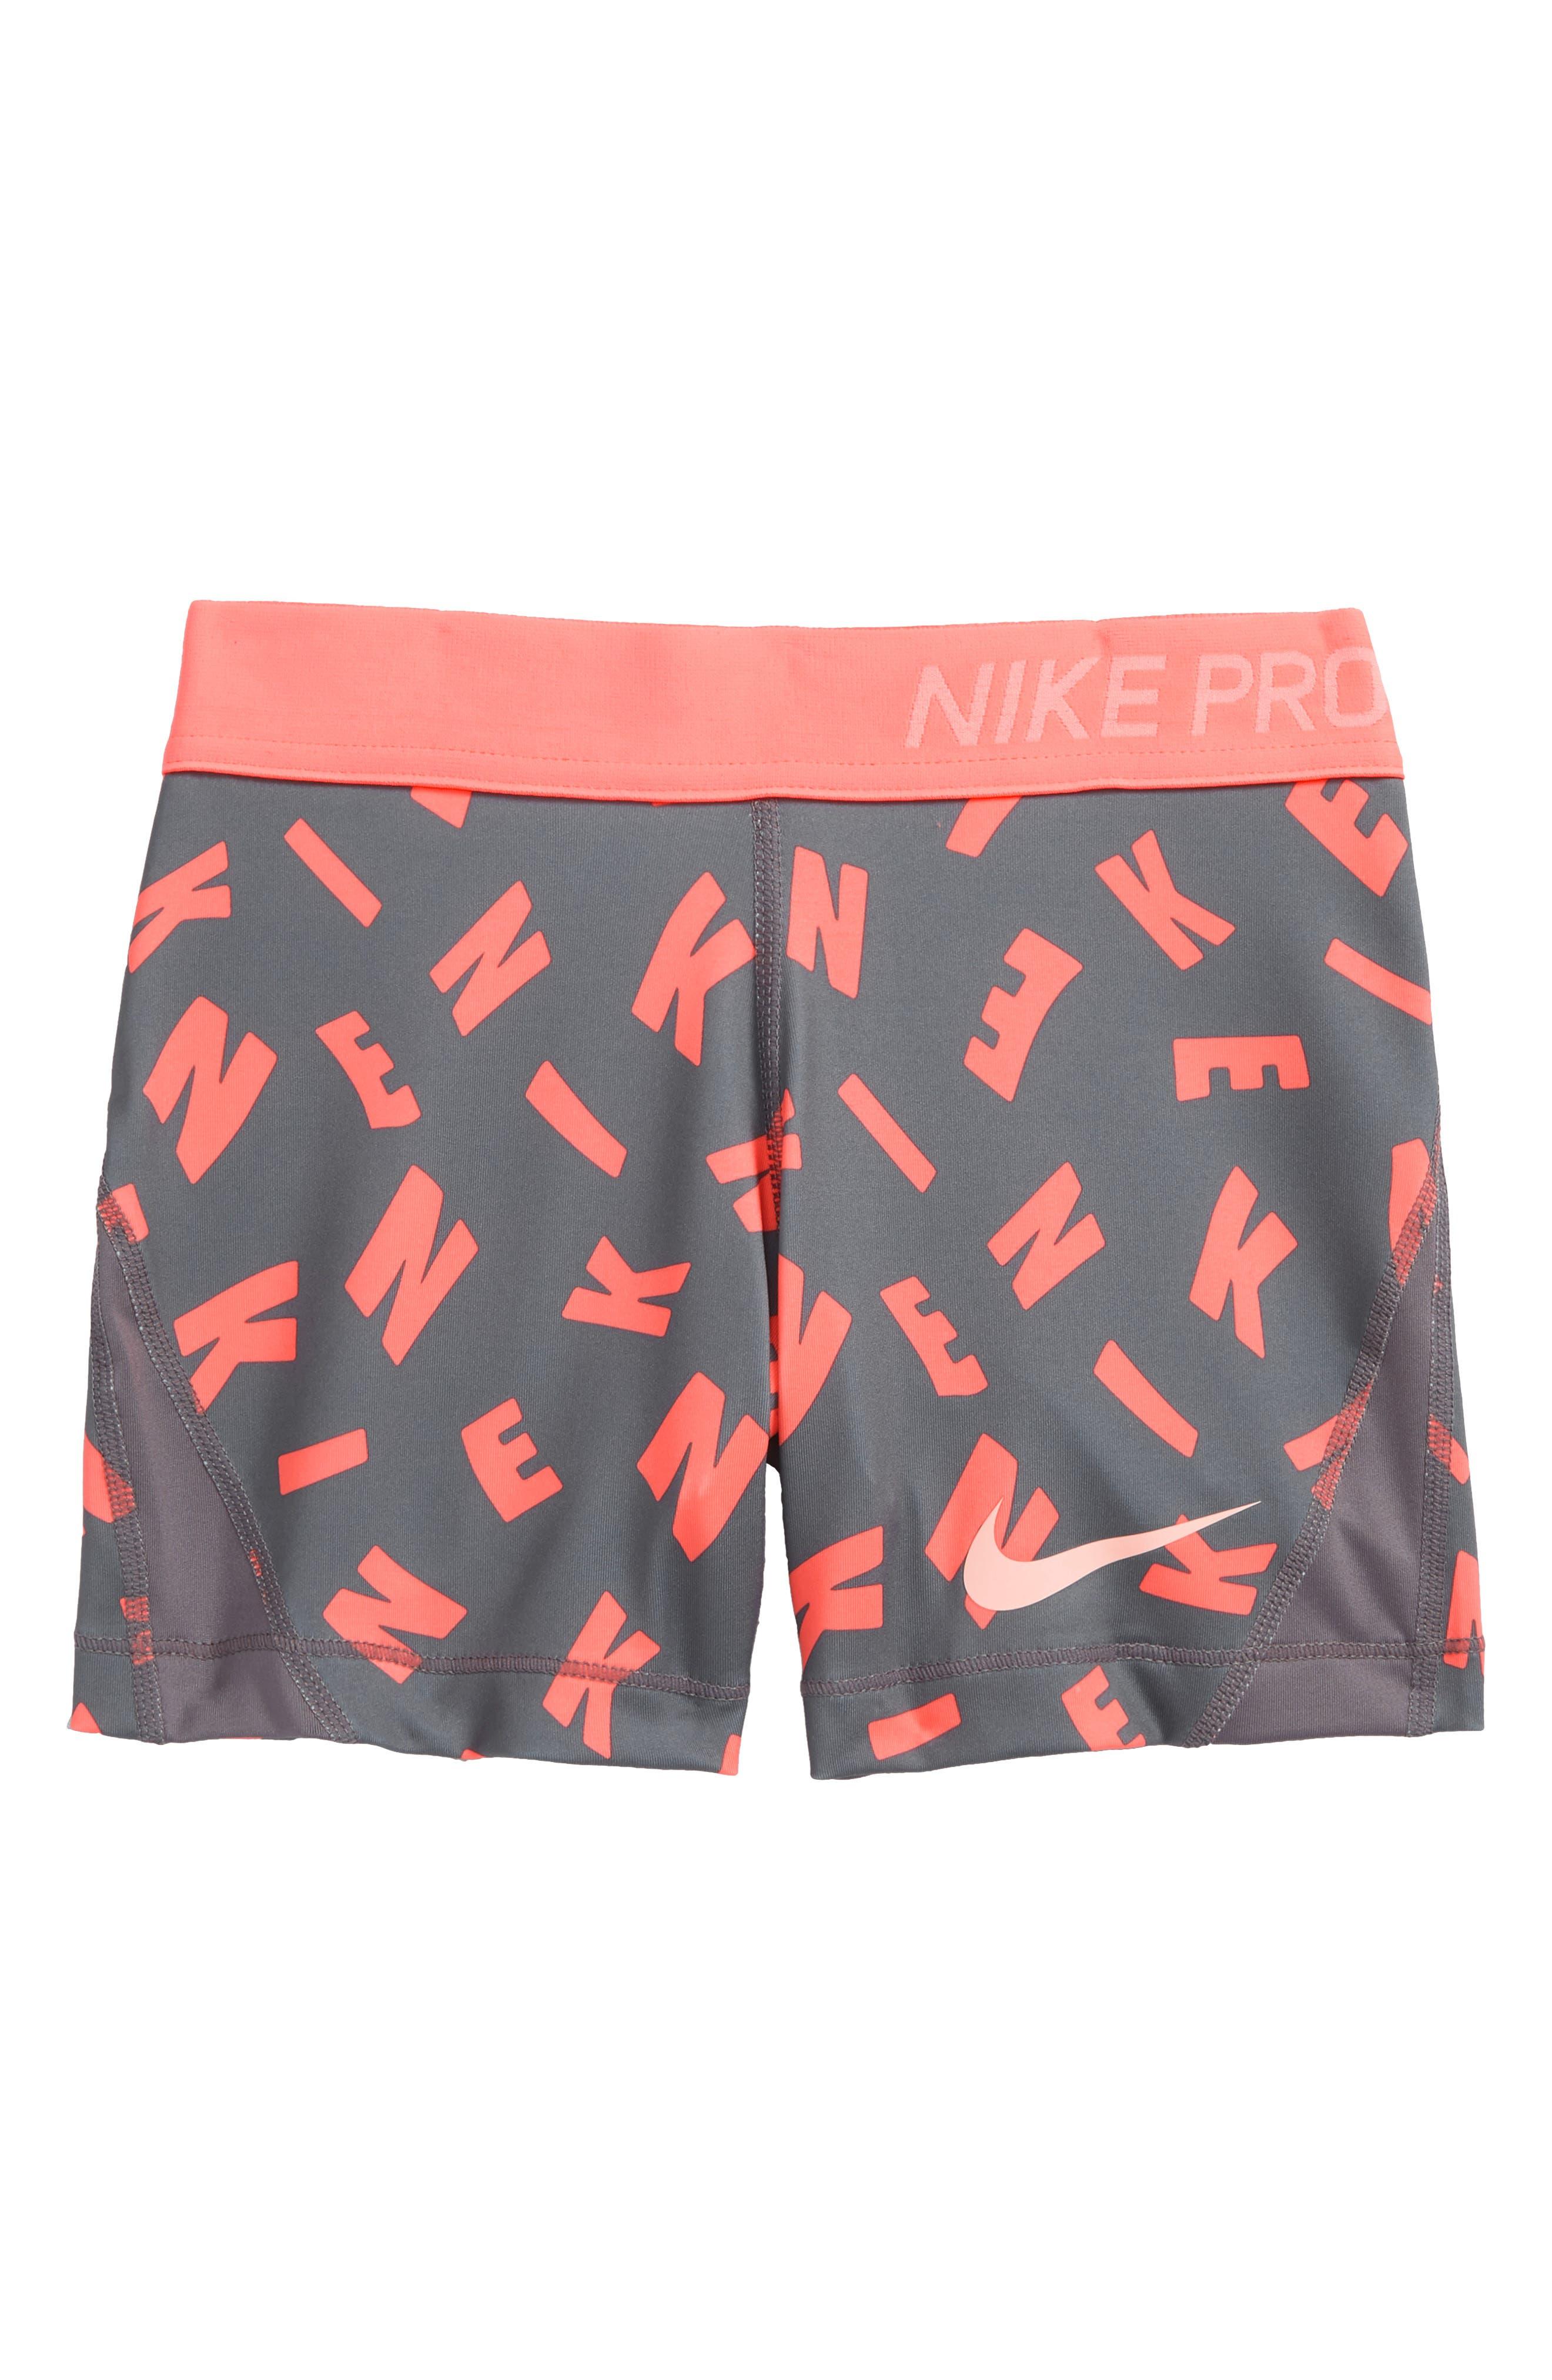 Pro Dry Shorts,                             Main thumbnail 1, color,                             Gun Smoke/ Crimson Tint